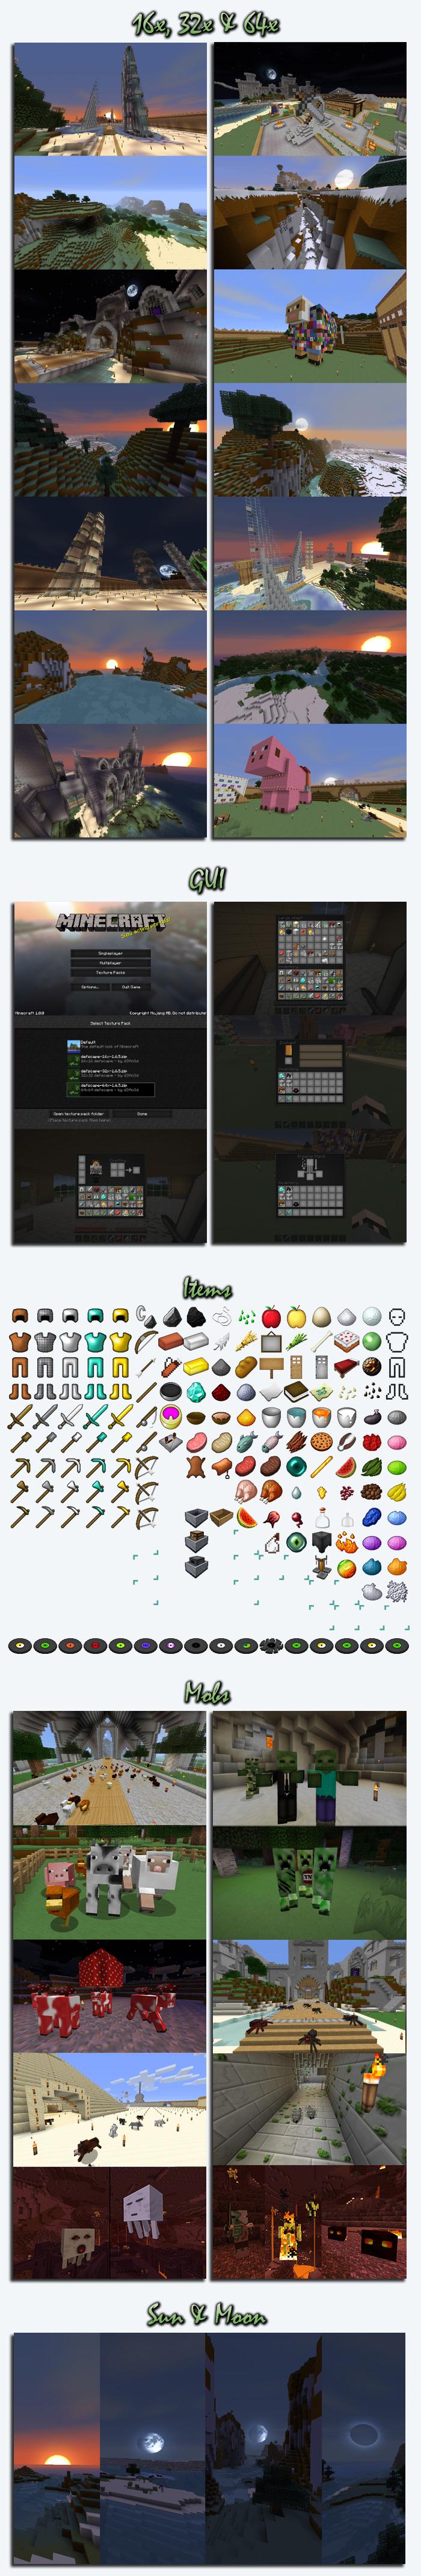 Defscape-texture-pack-1.jpg